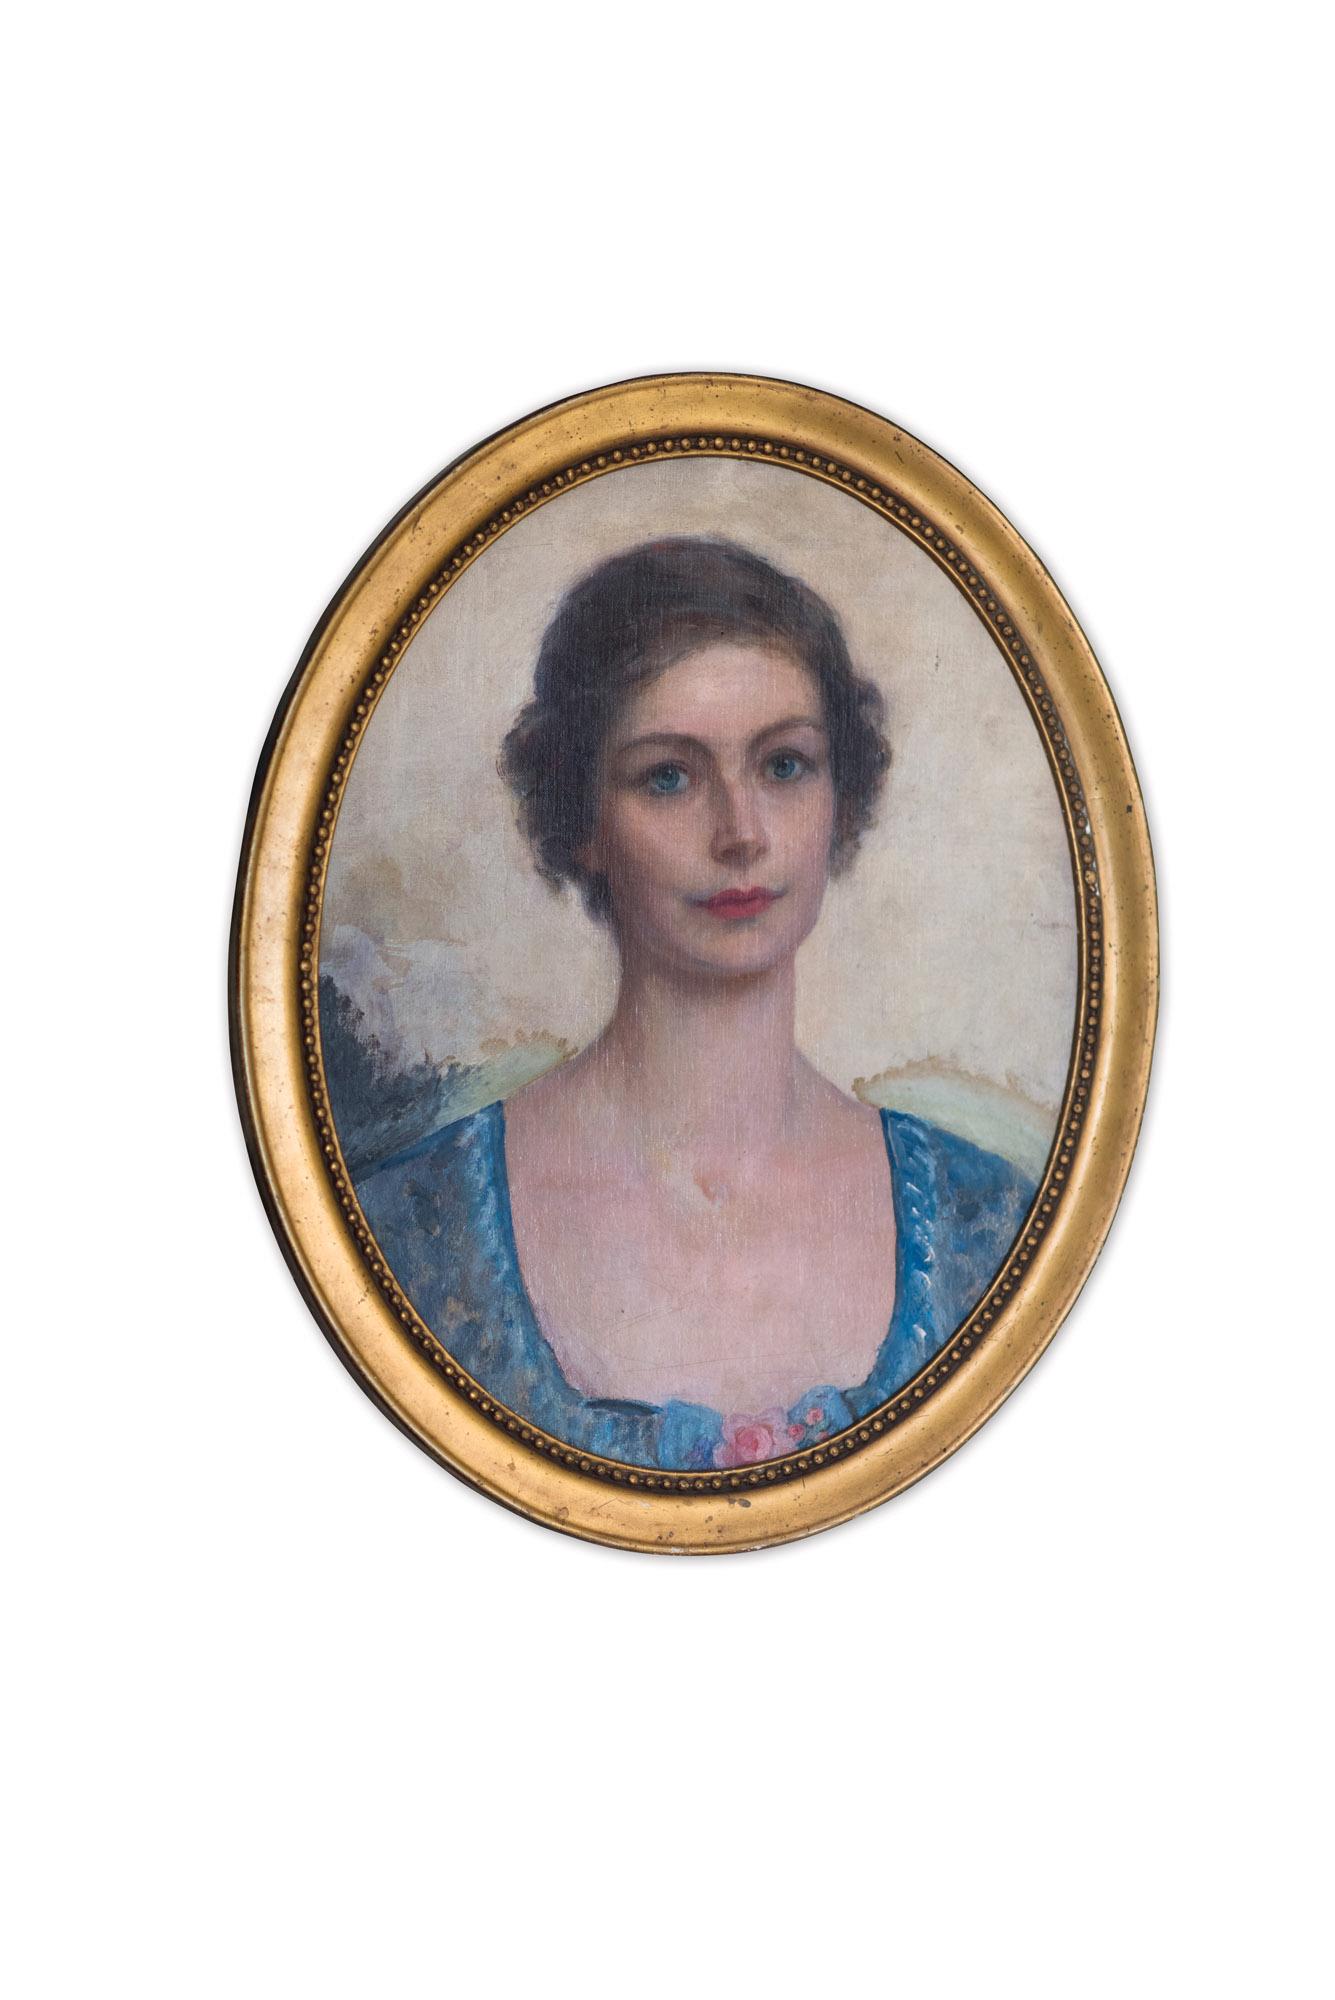 Caroline Ferriday portrait